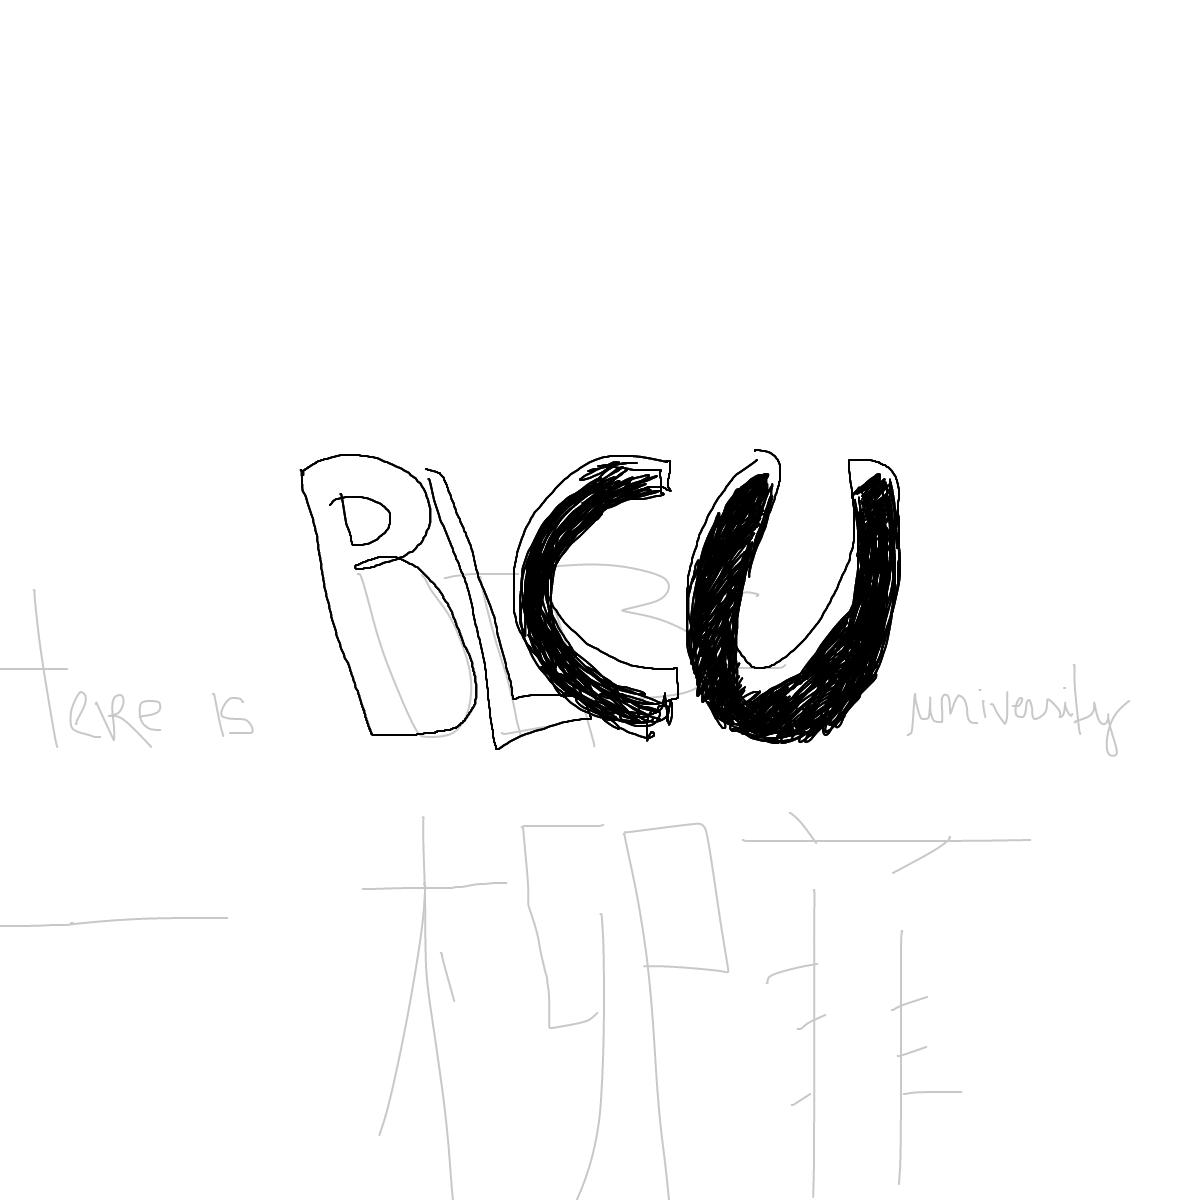 BAAAM drawing#7732 lat:39.9861984252929700lng: 116.4283523559570300